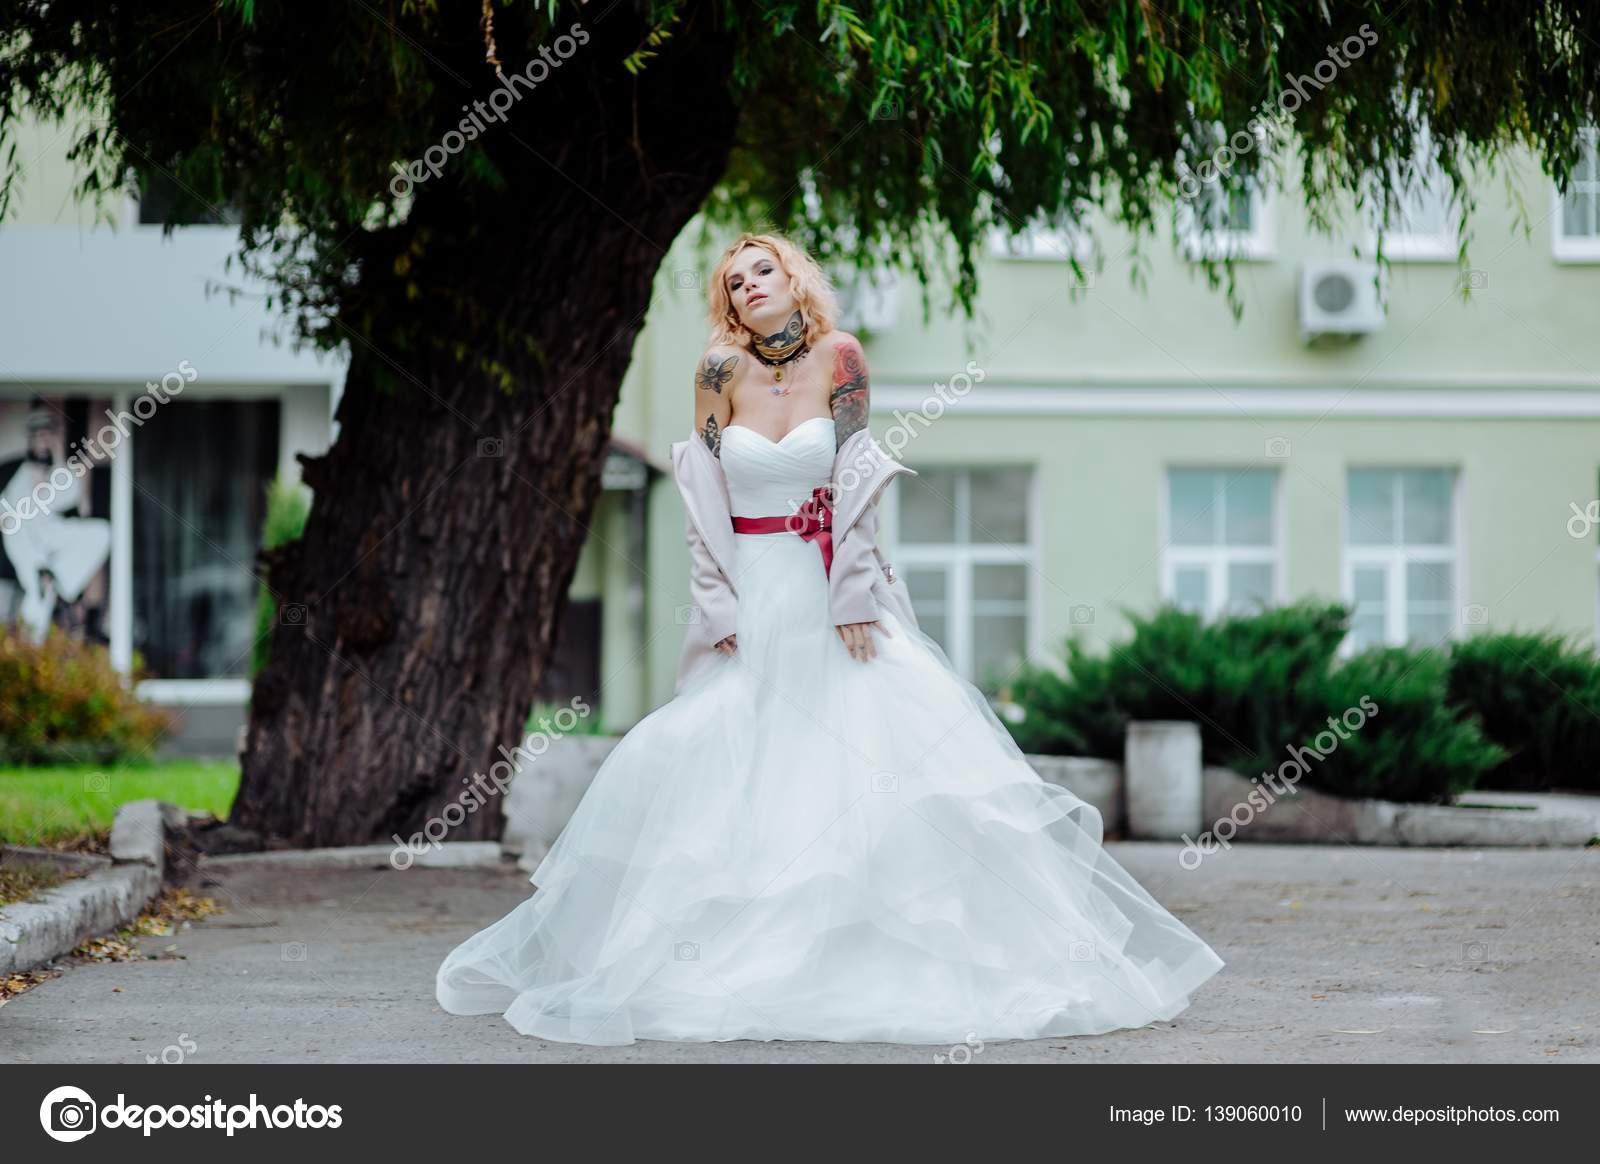 2a7add169f27 Όμορφη νύφη με τατουάζ στο γάμο πρωί — Φωτογραφία Αρχείου ...